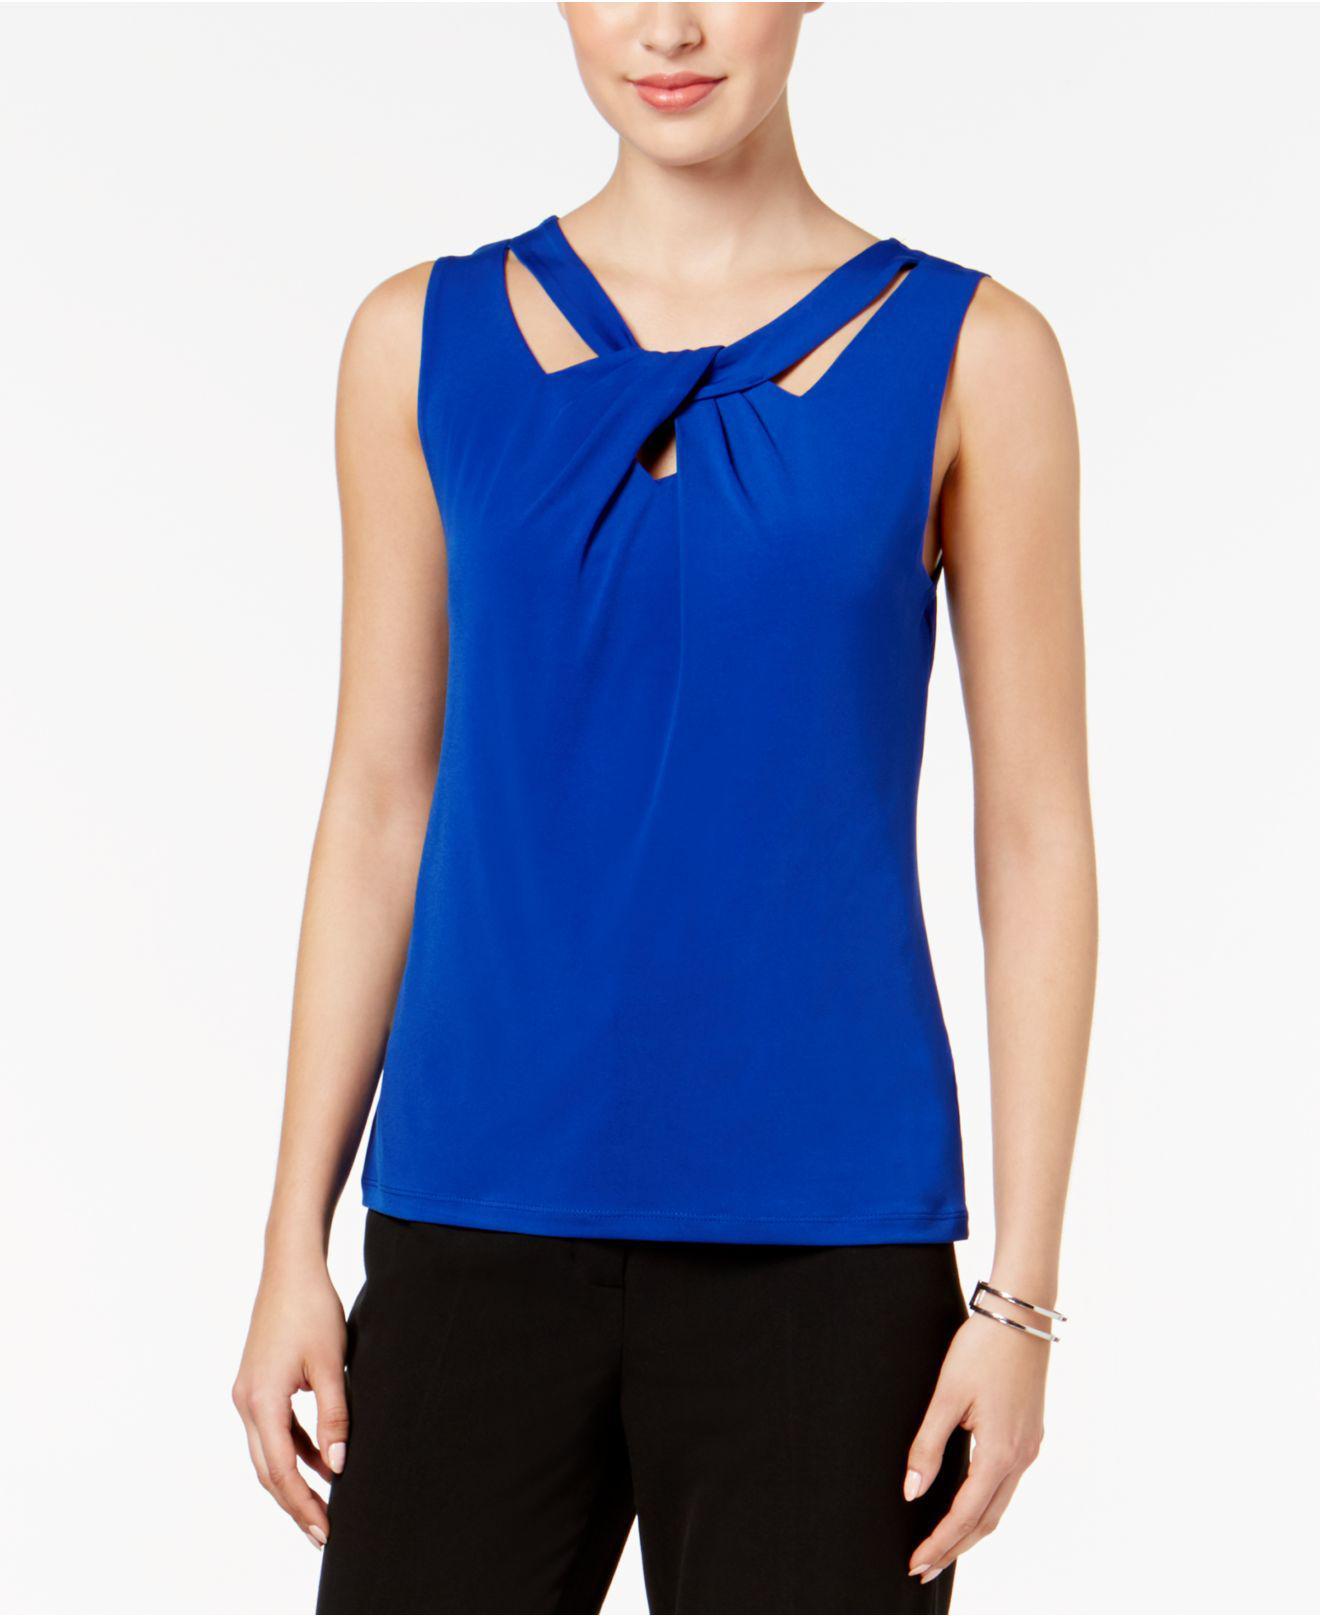 881bca4c23891 Lyst - Nine West Sleeveless Cutout Twist-front Top in Blue